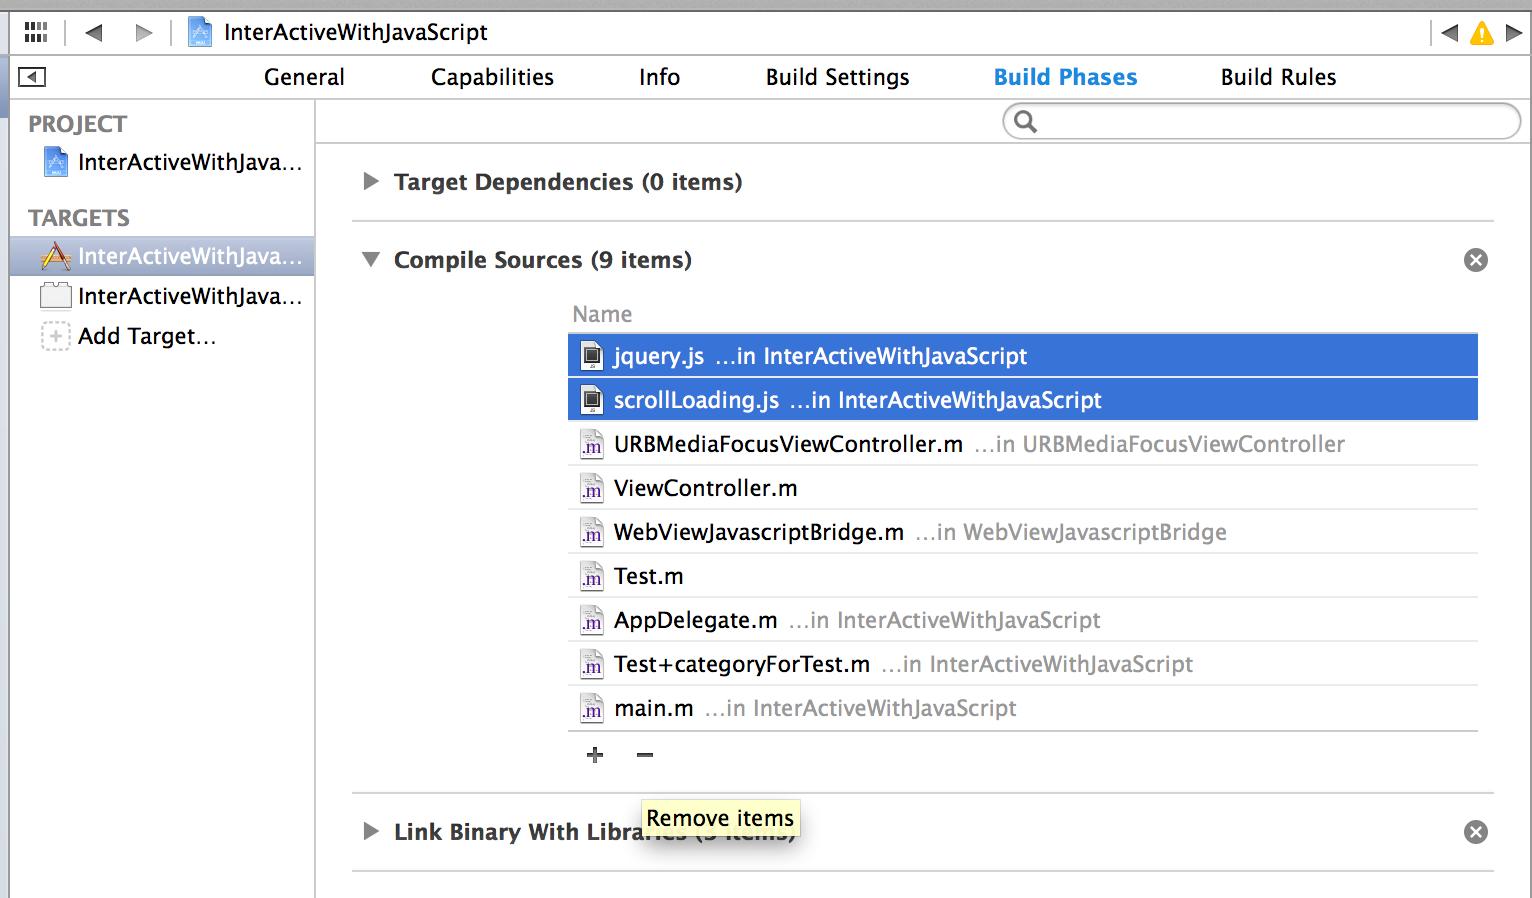 展开Compile Sources后能看到两个js文件